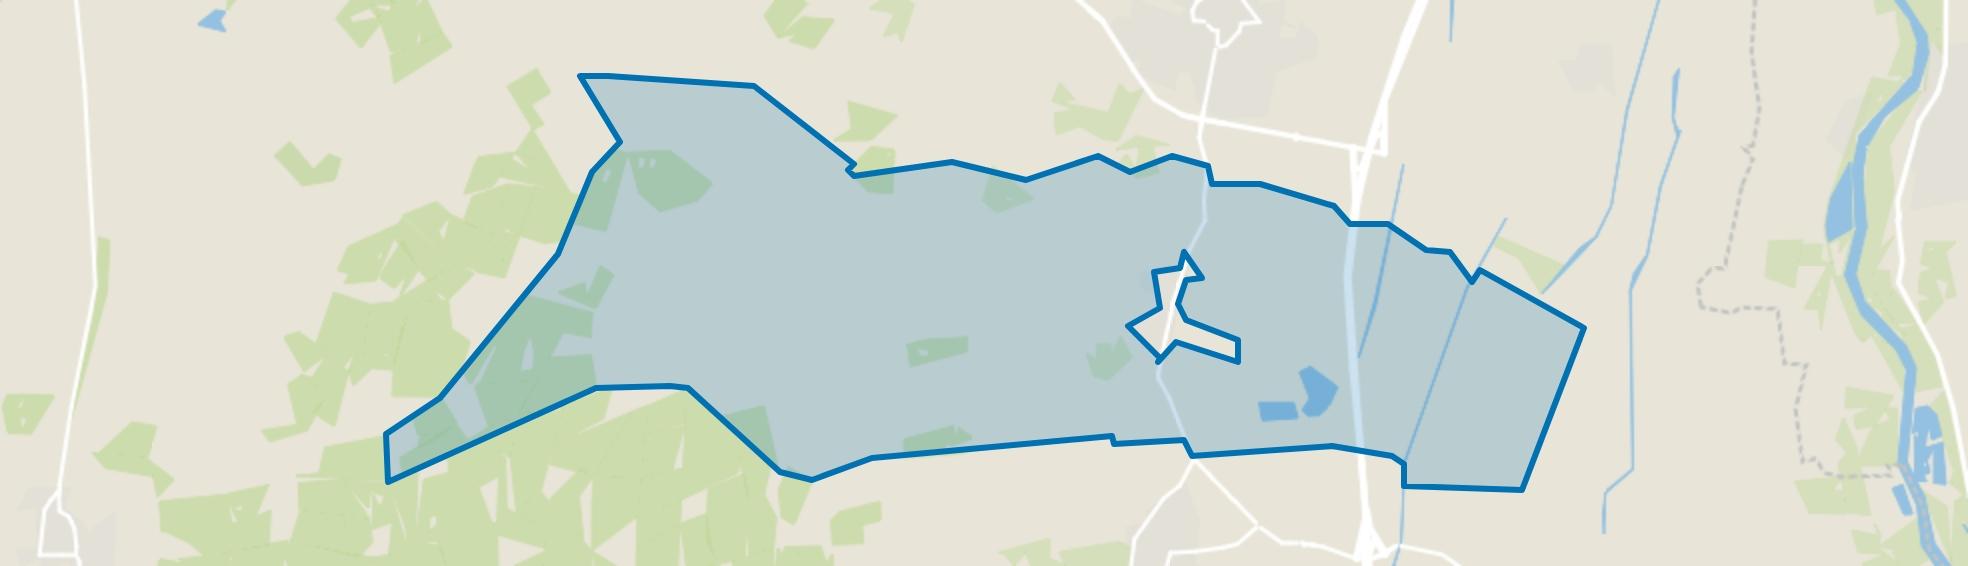 Buitengebied Emst, Emst map